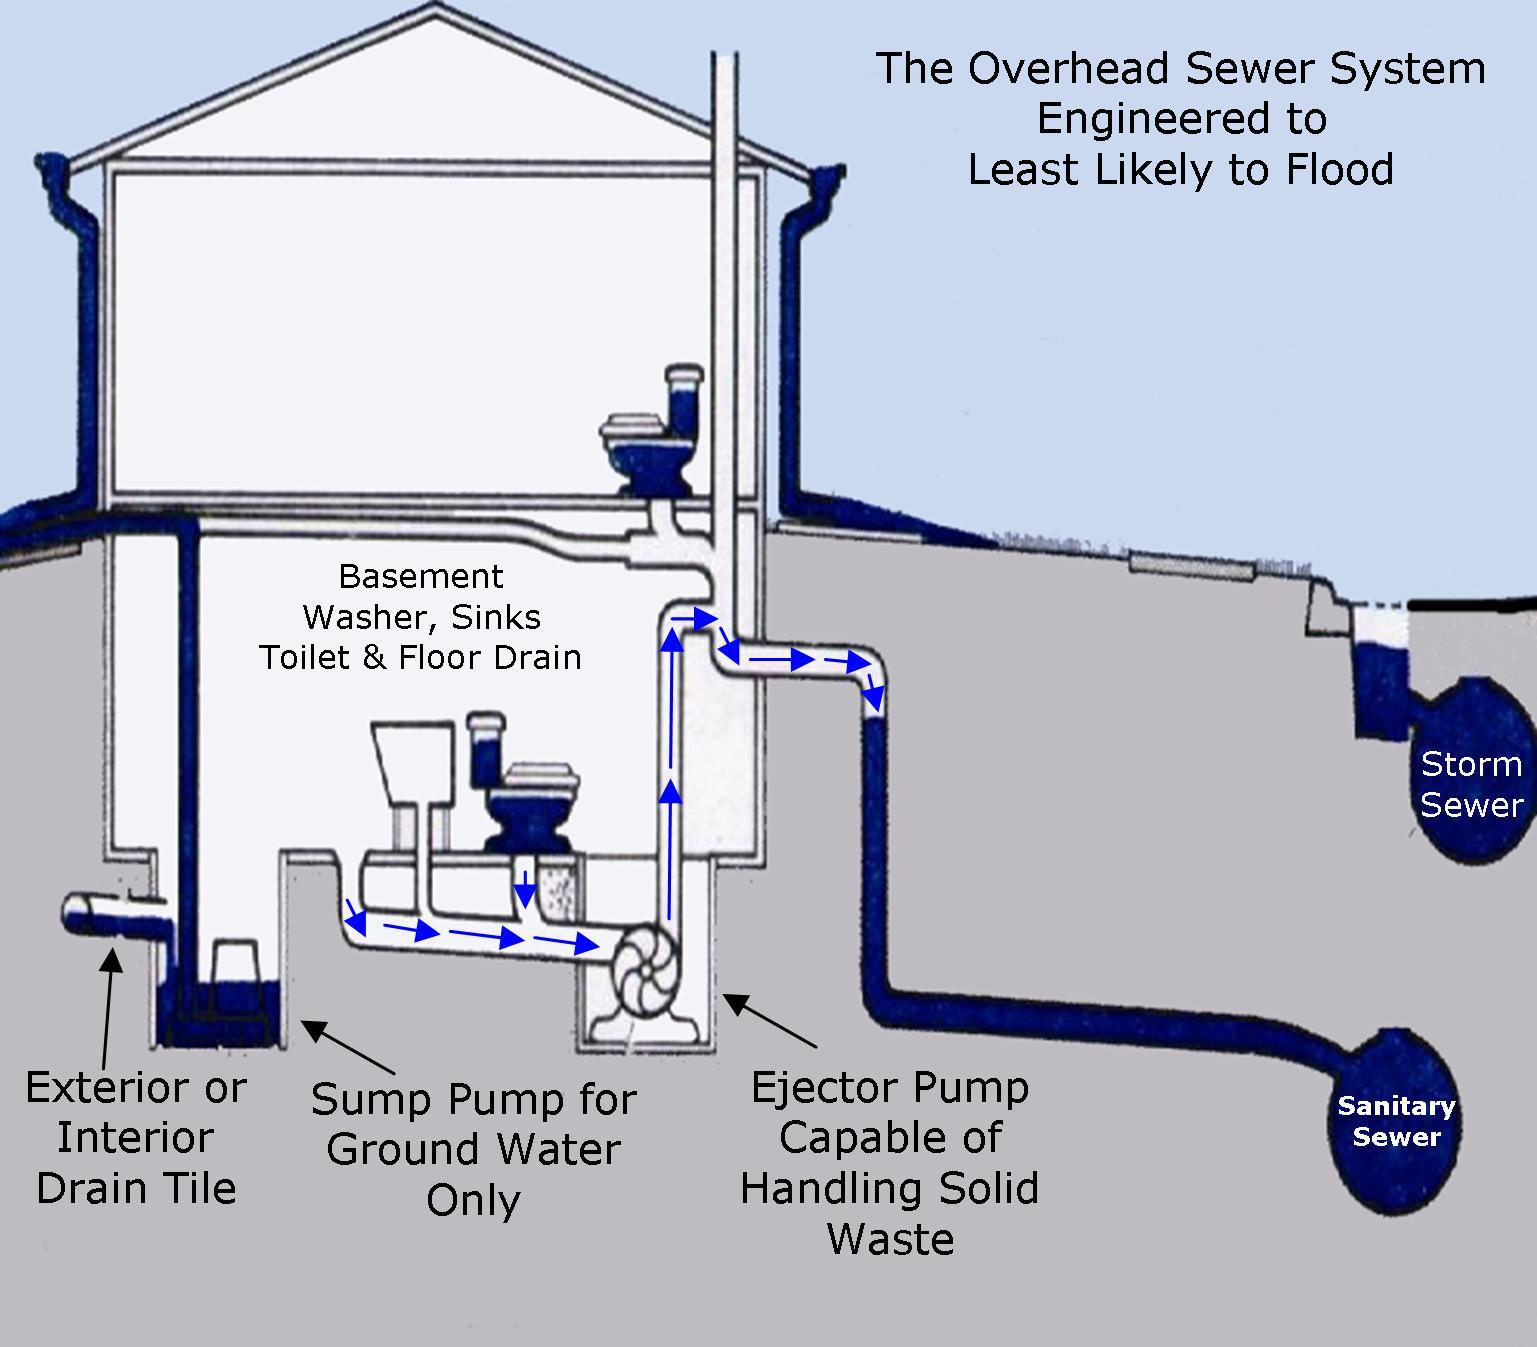 sewerage backup system